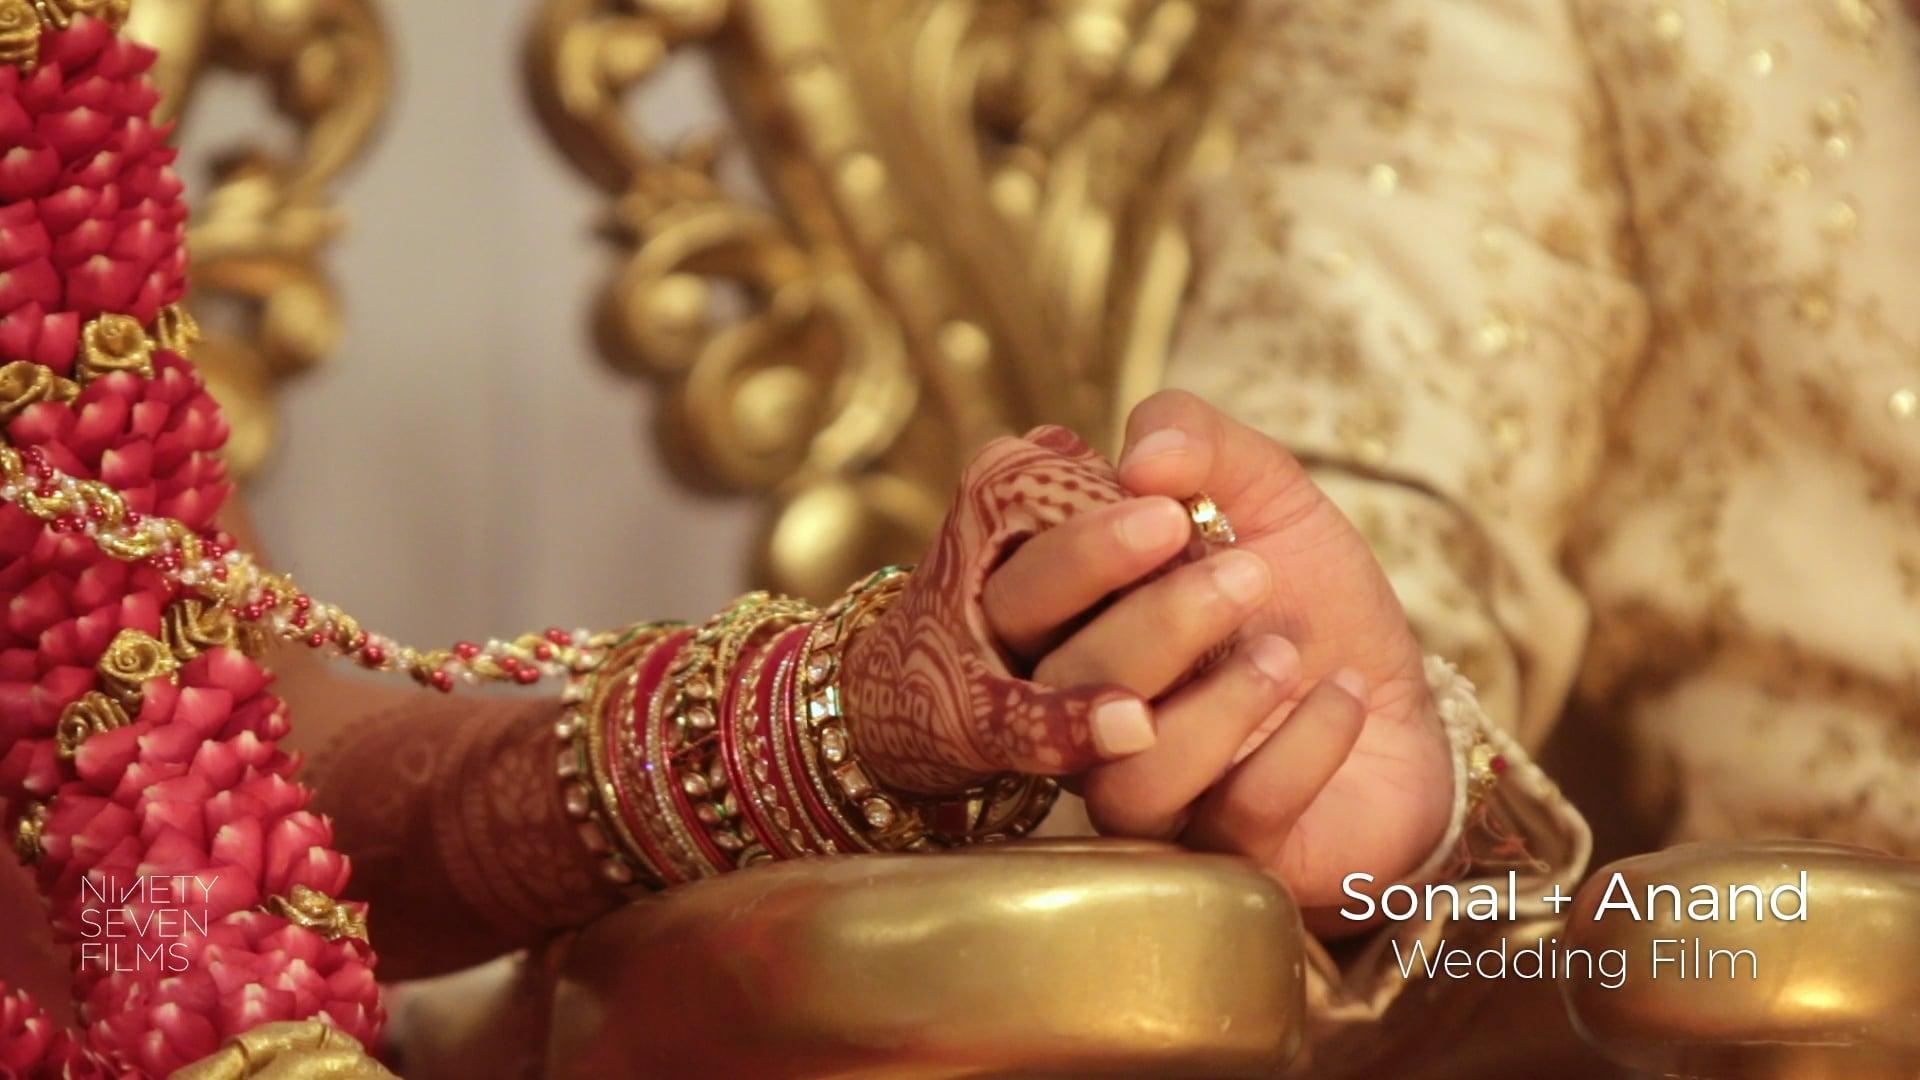 The Henry Hotel Dearborn Hindu Wedding | Sonal + Anand Wedding Film